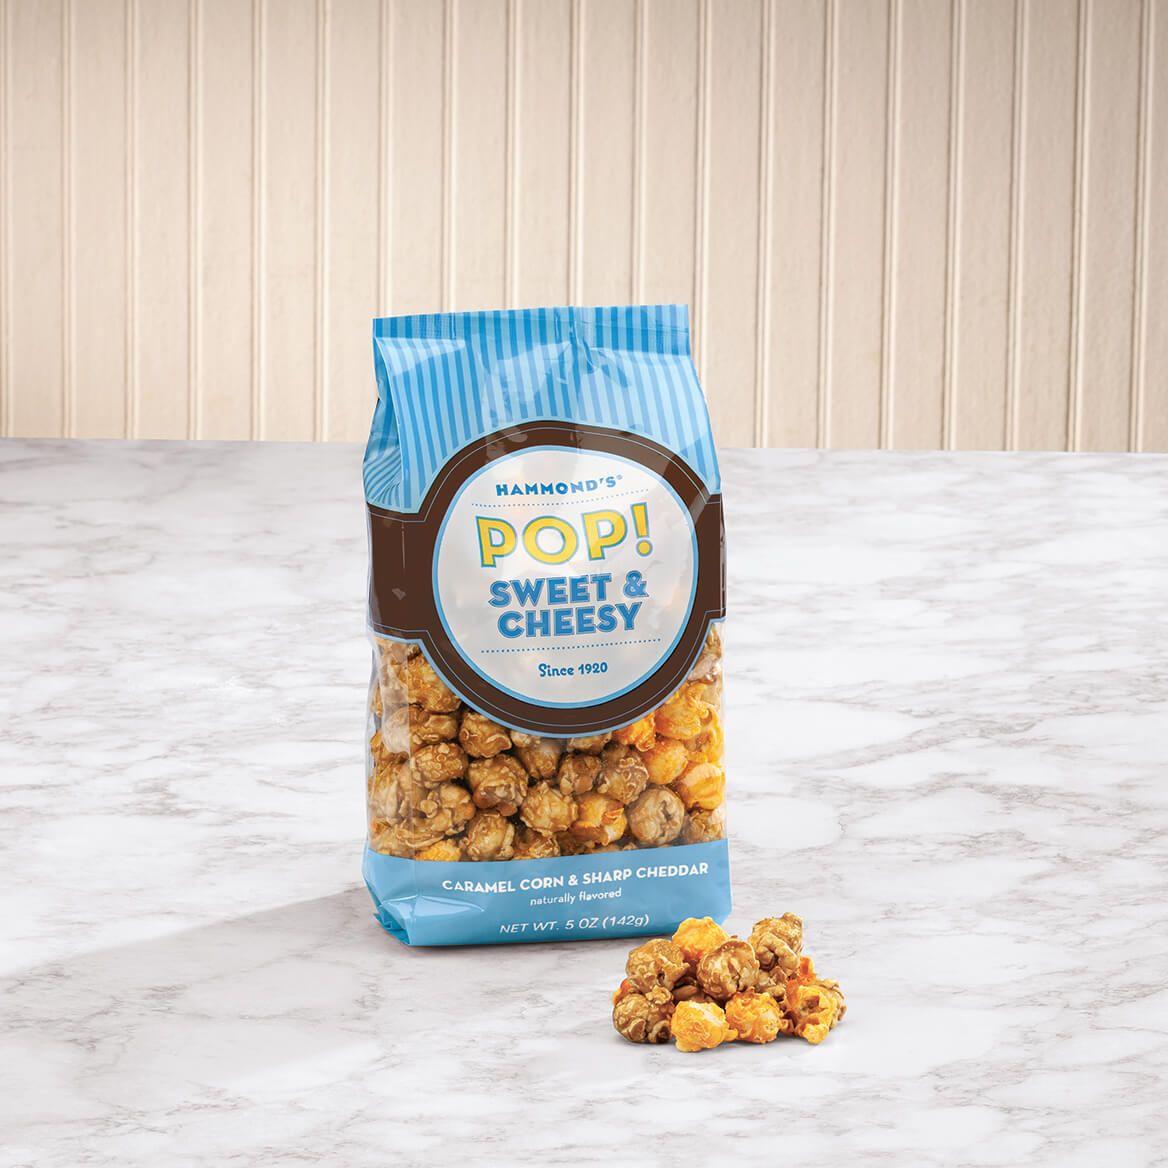 Hammonds® POP! Sweet & Cheesy Popcorn, 5oz.-370780